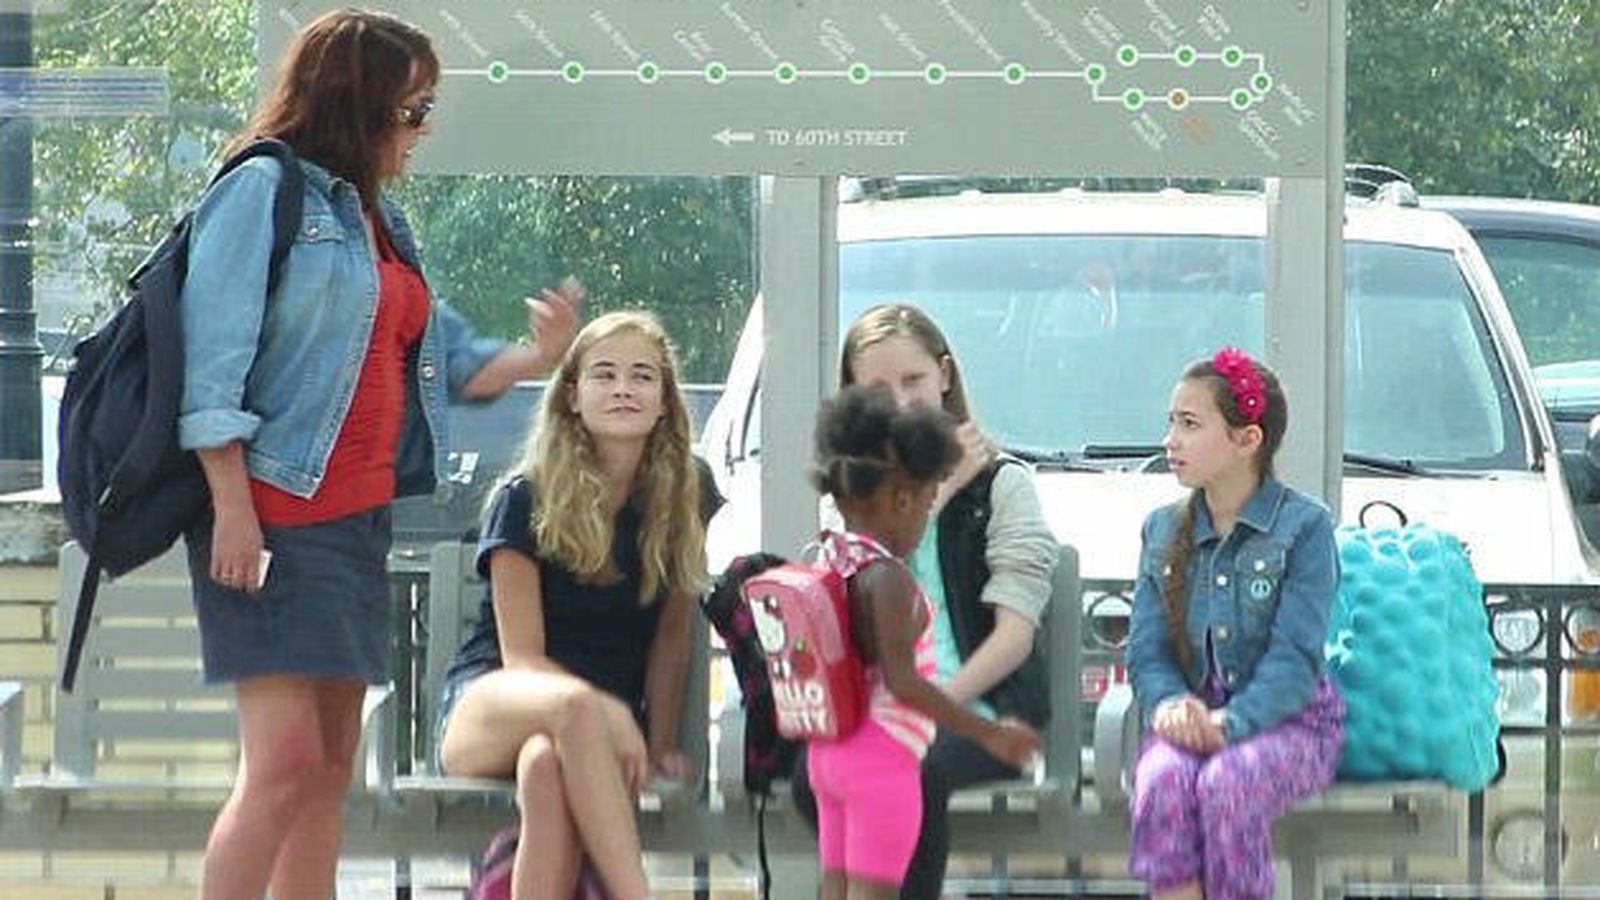 Foto: Un experimento ha querido comprobar la forma de actuar ante un caso de 'bullying' (captura de YouTube)